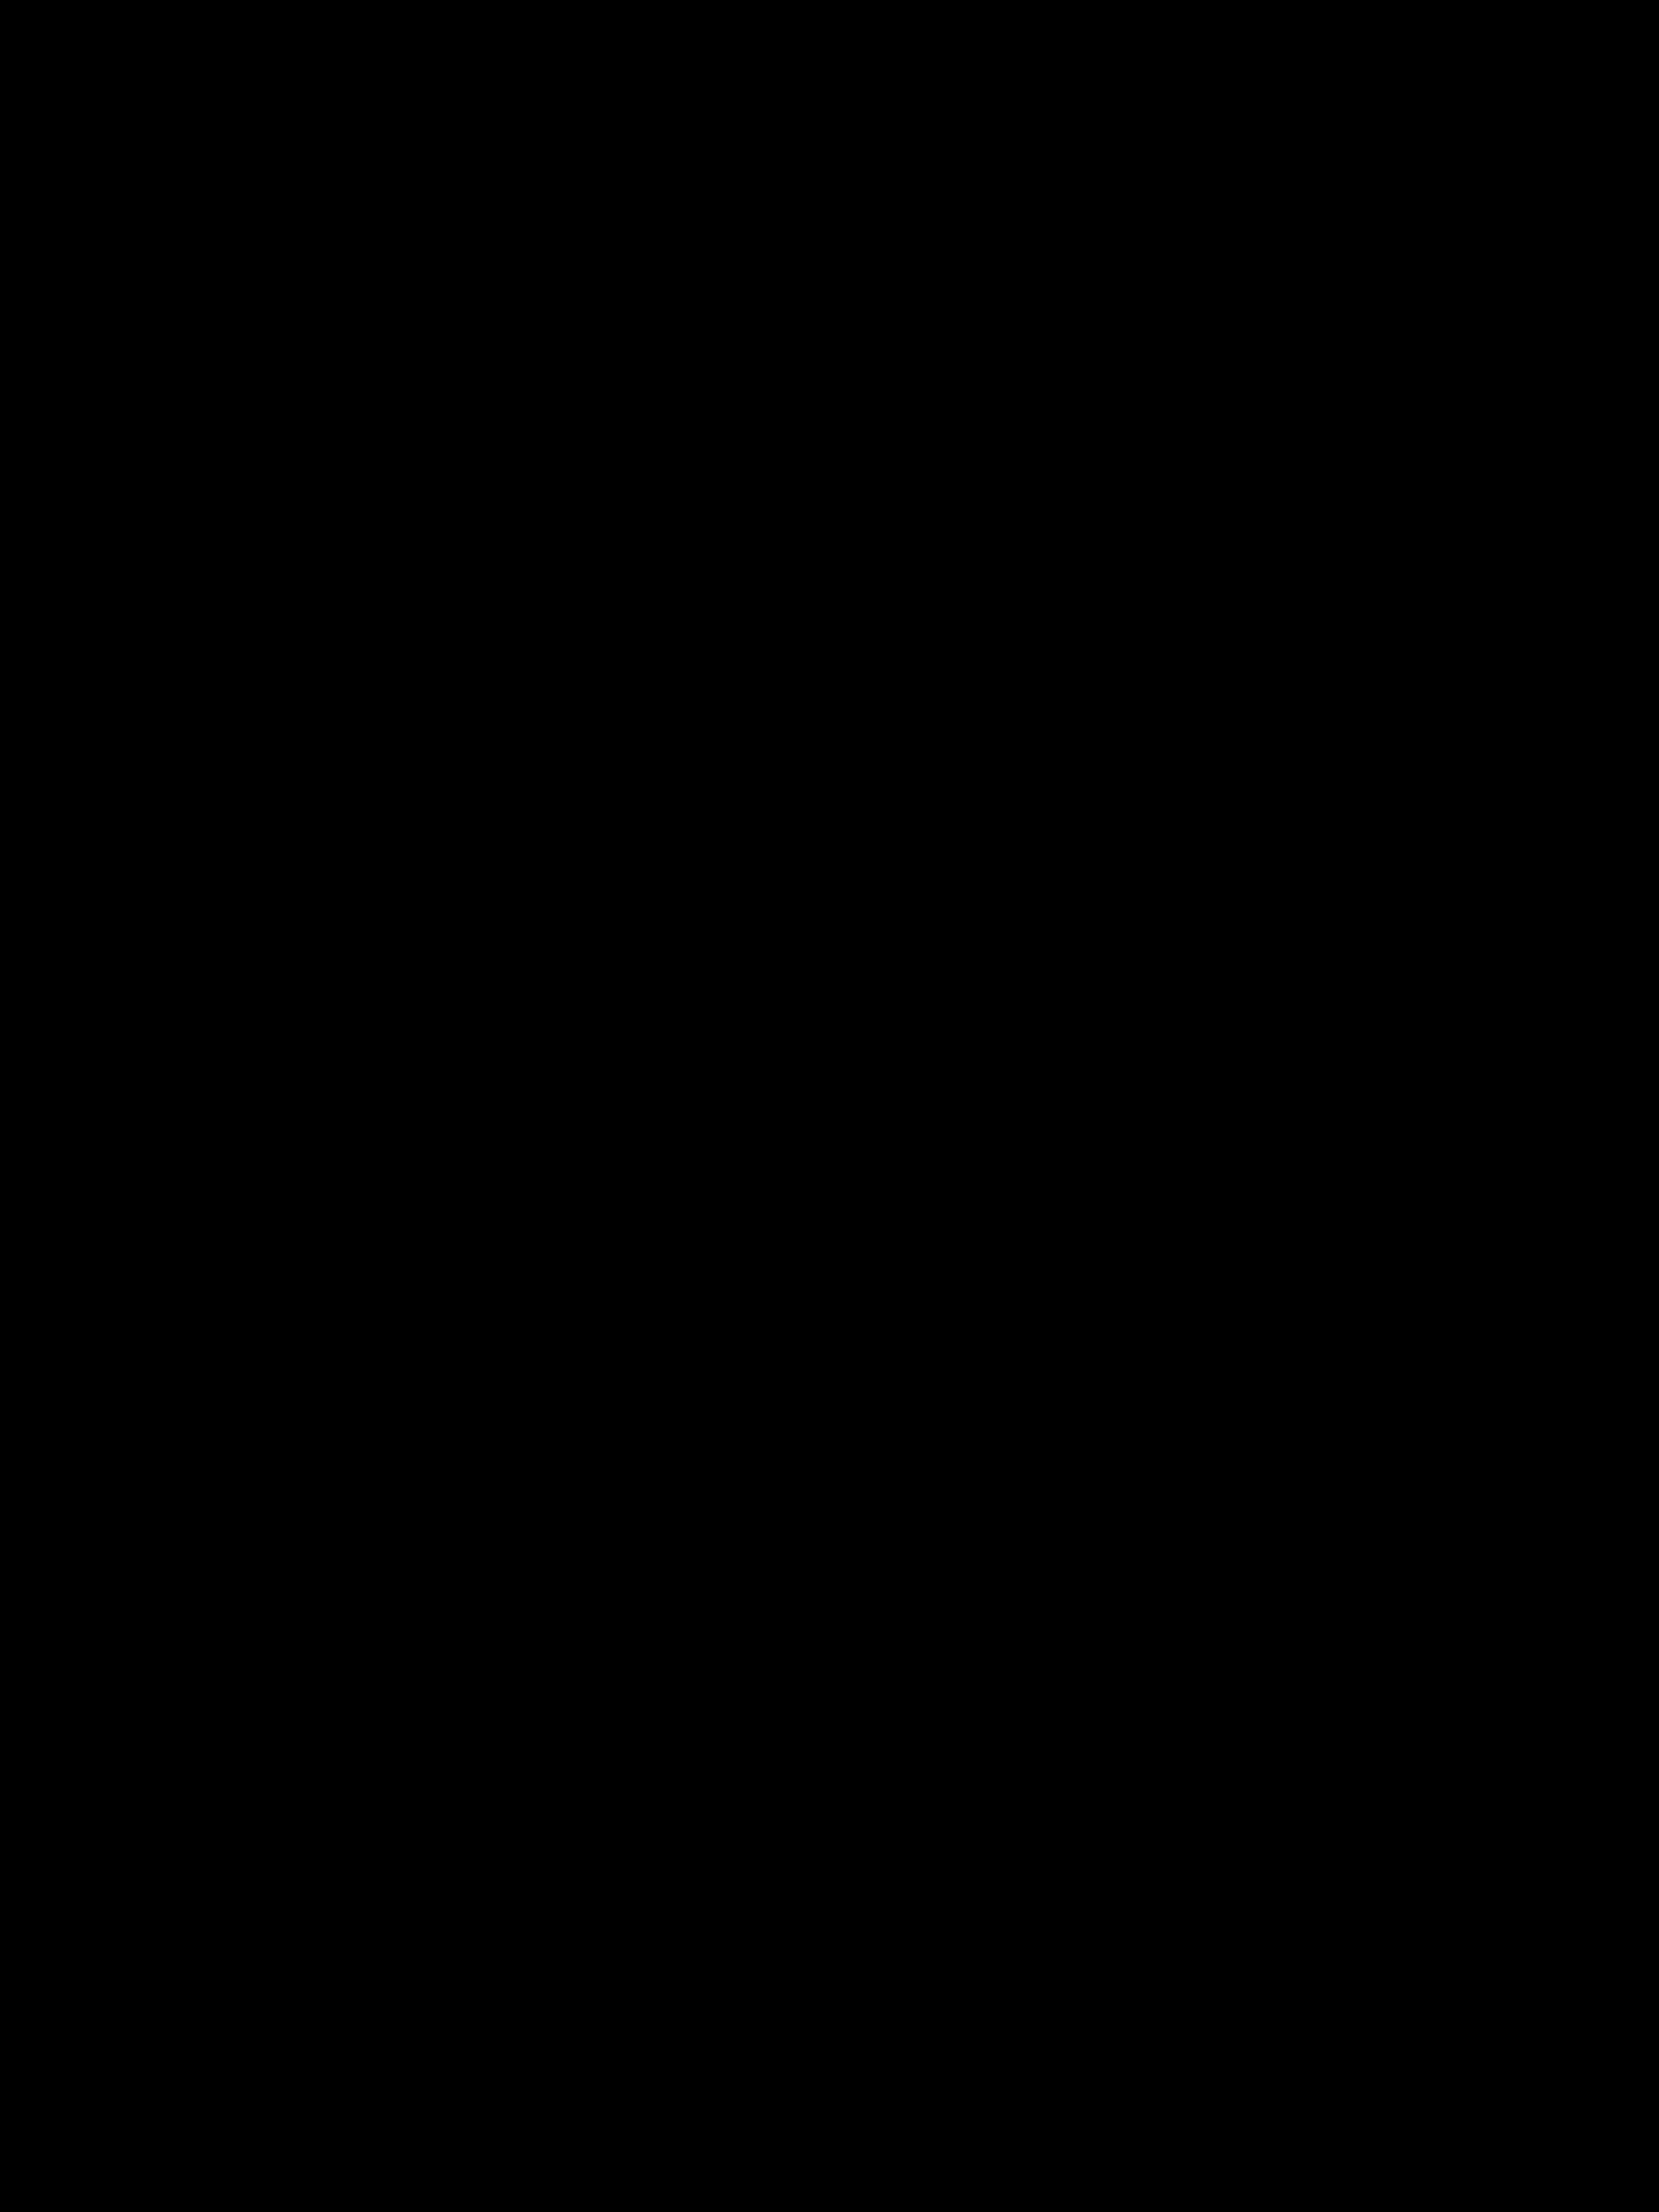 2014-03-21 11.54.45